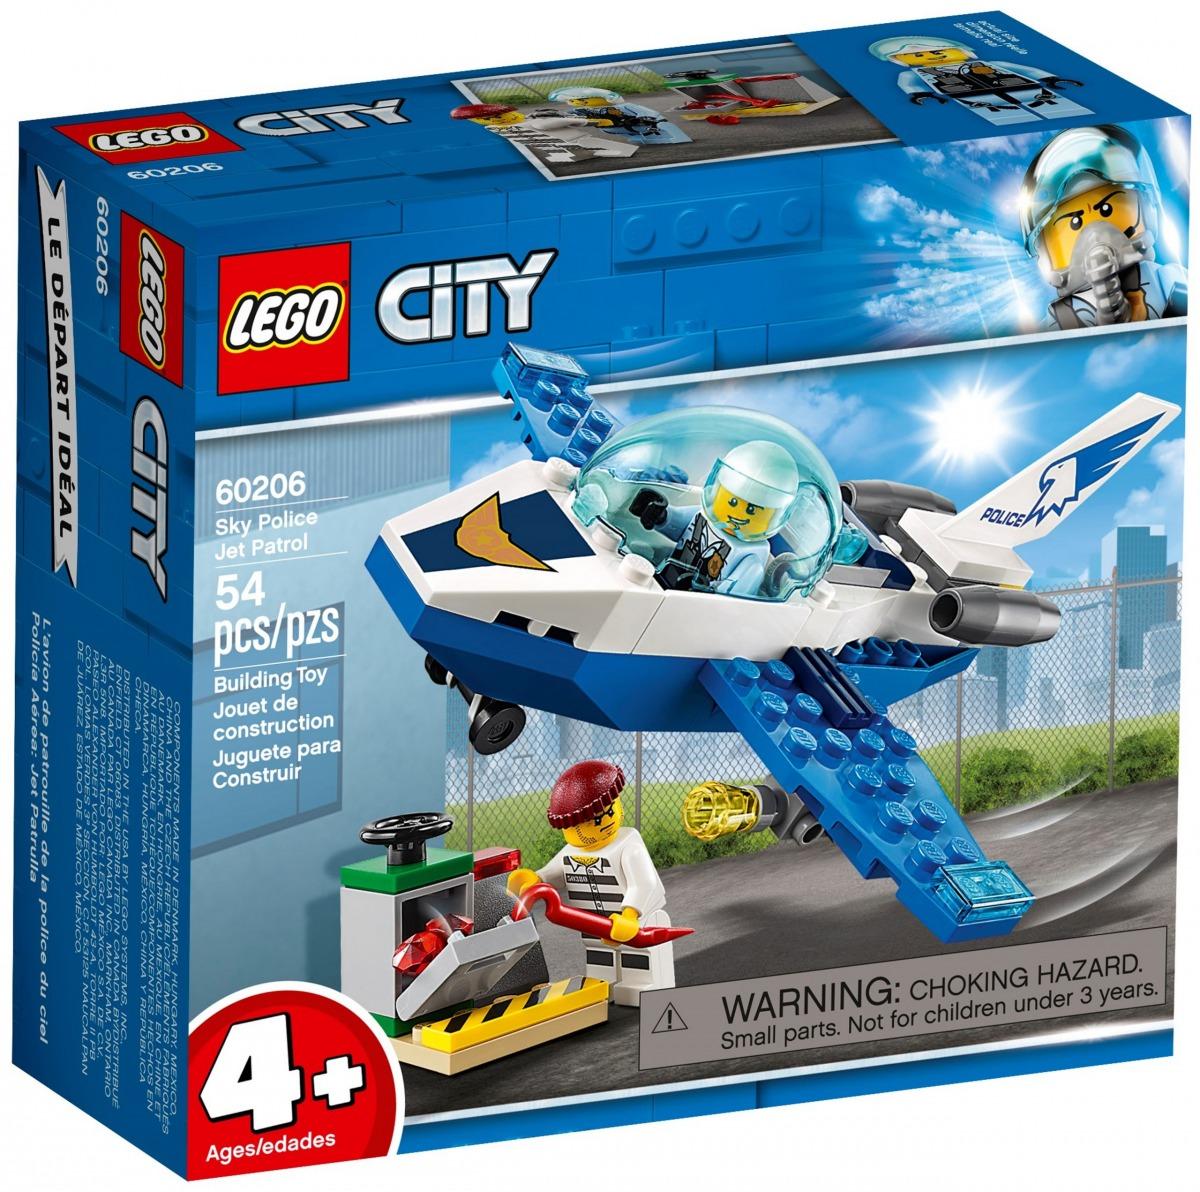 lego 60206 sky police jet patrol scaled